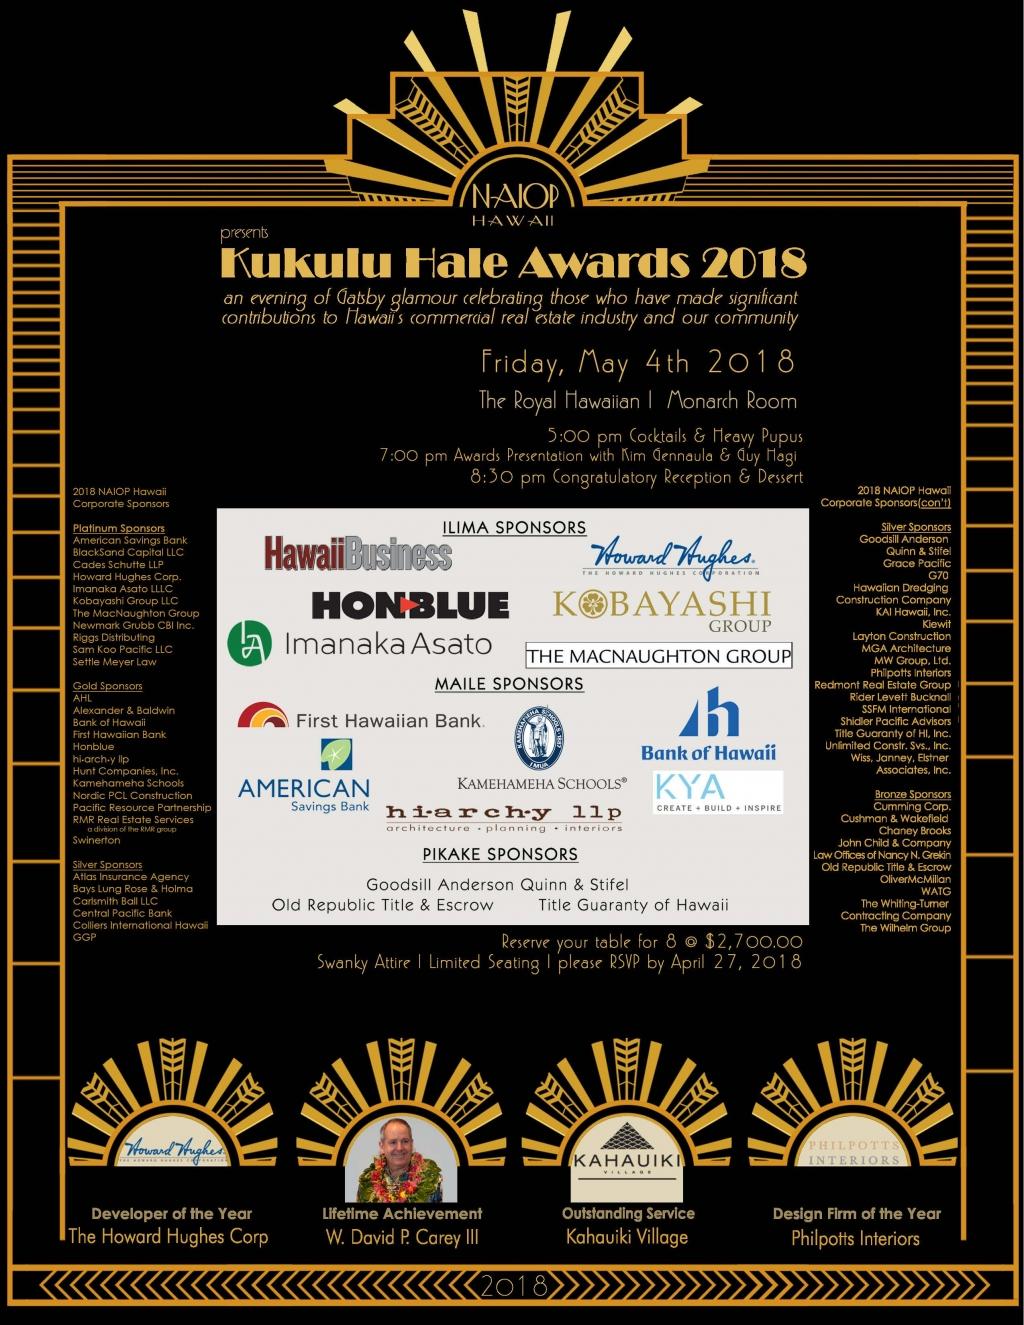 NAIOP Hawaii Kukulu Hale Awards Ceremony